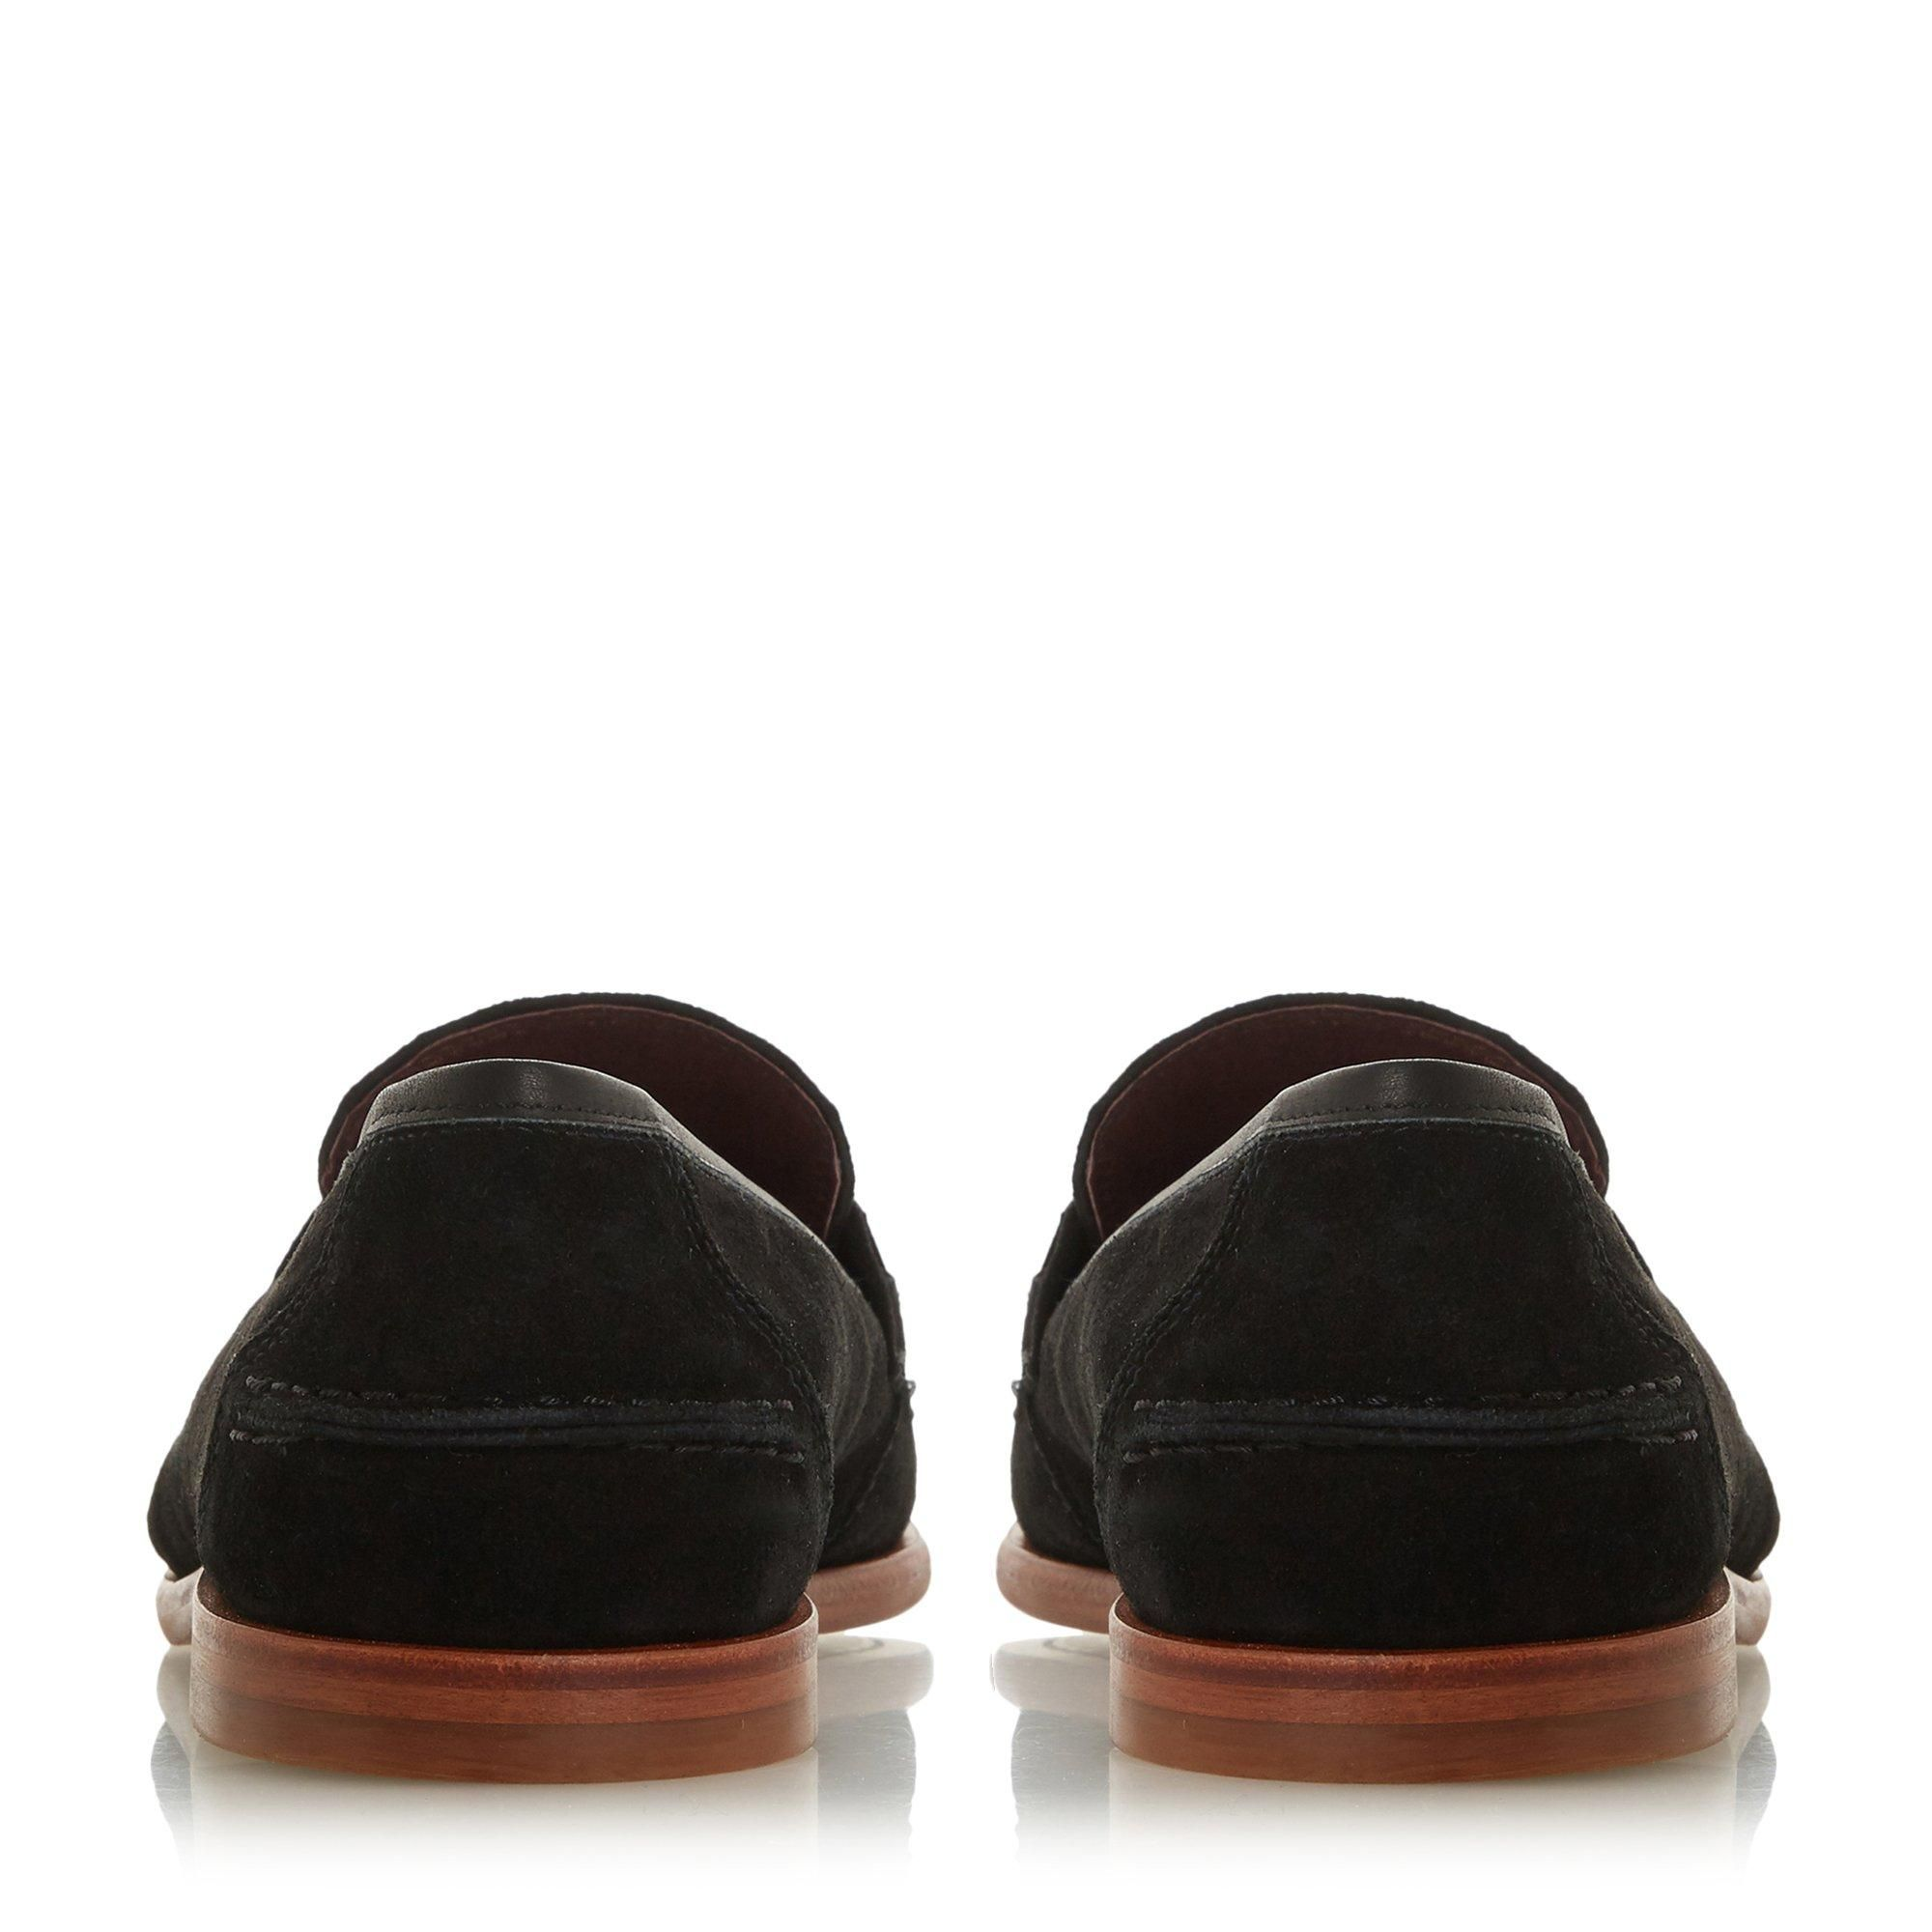 Bertie Mens SURBITON Suede Square Toe Loafer